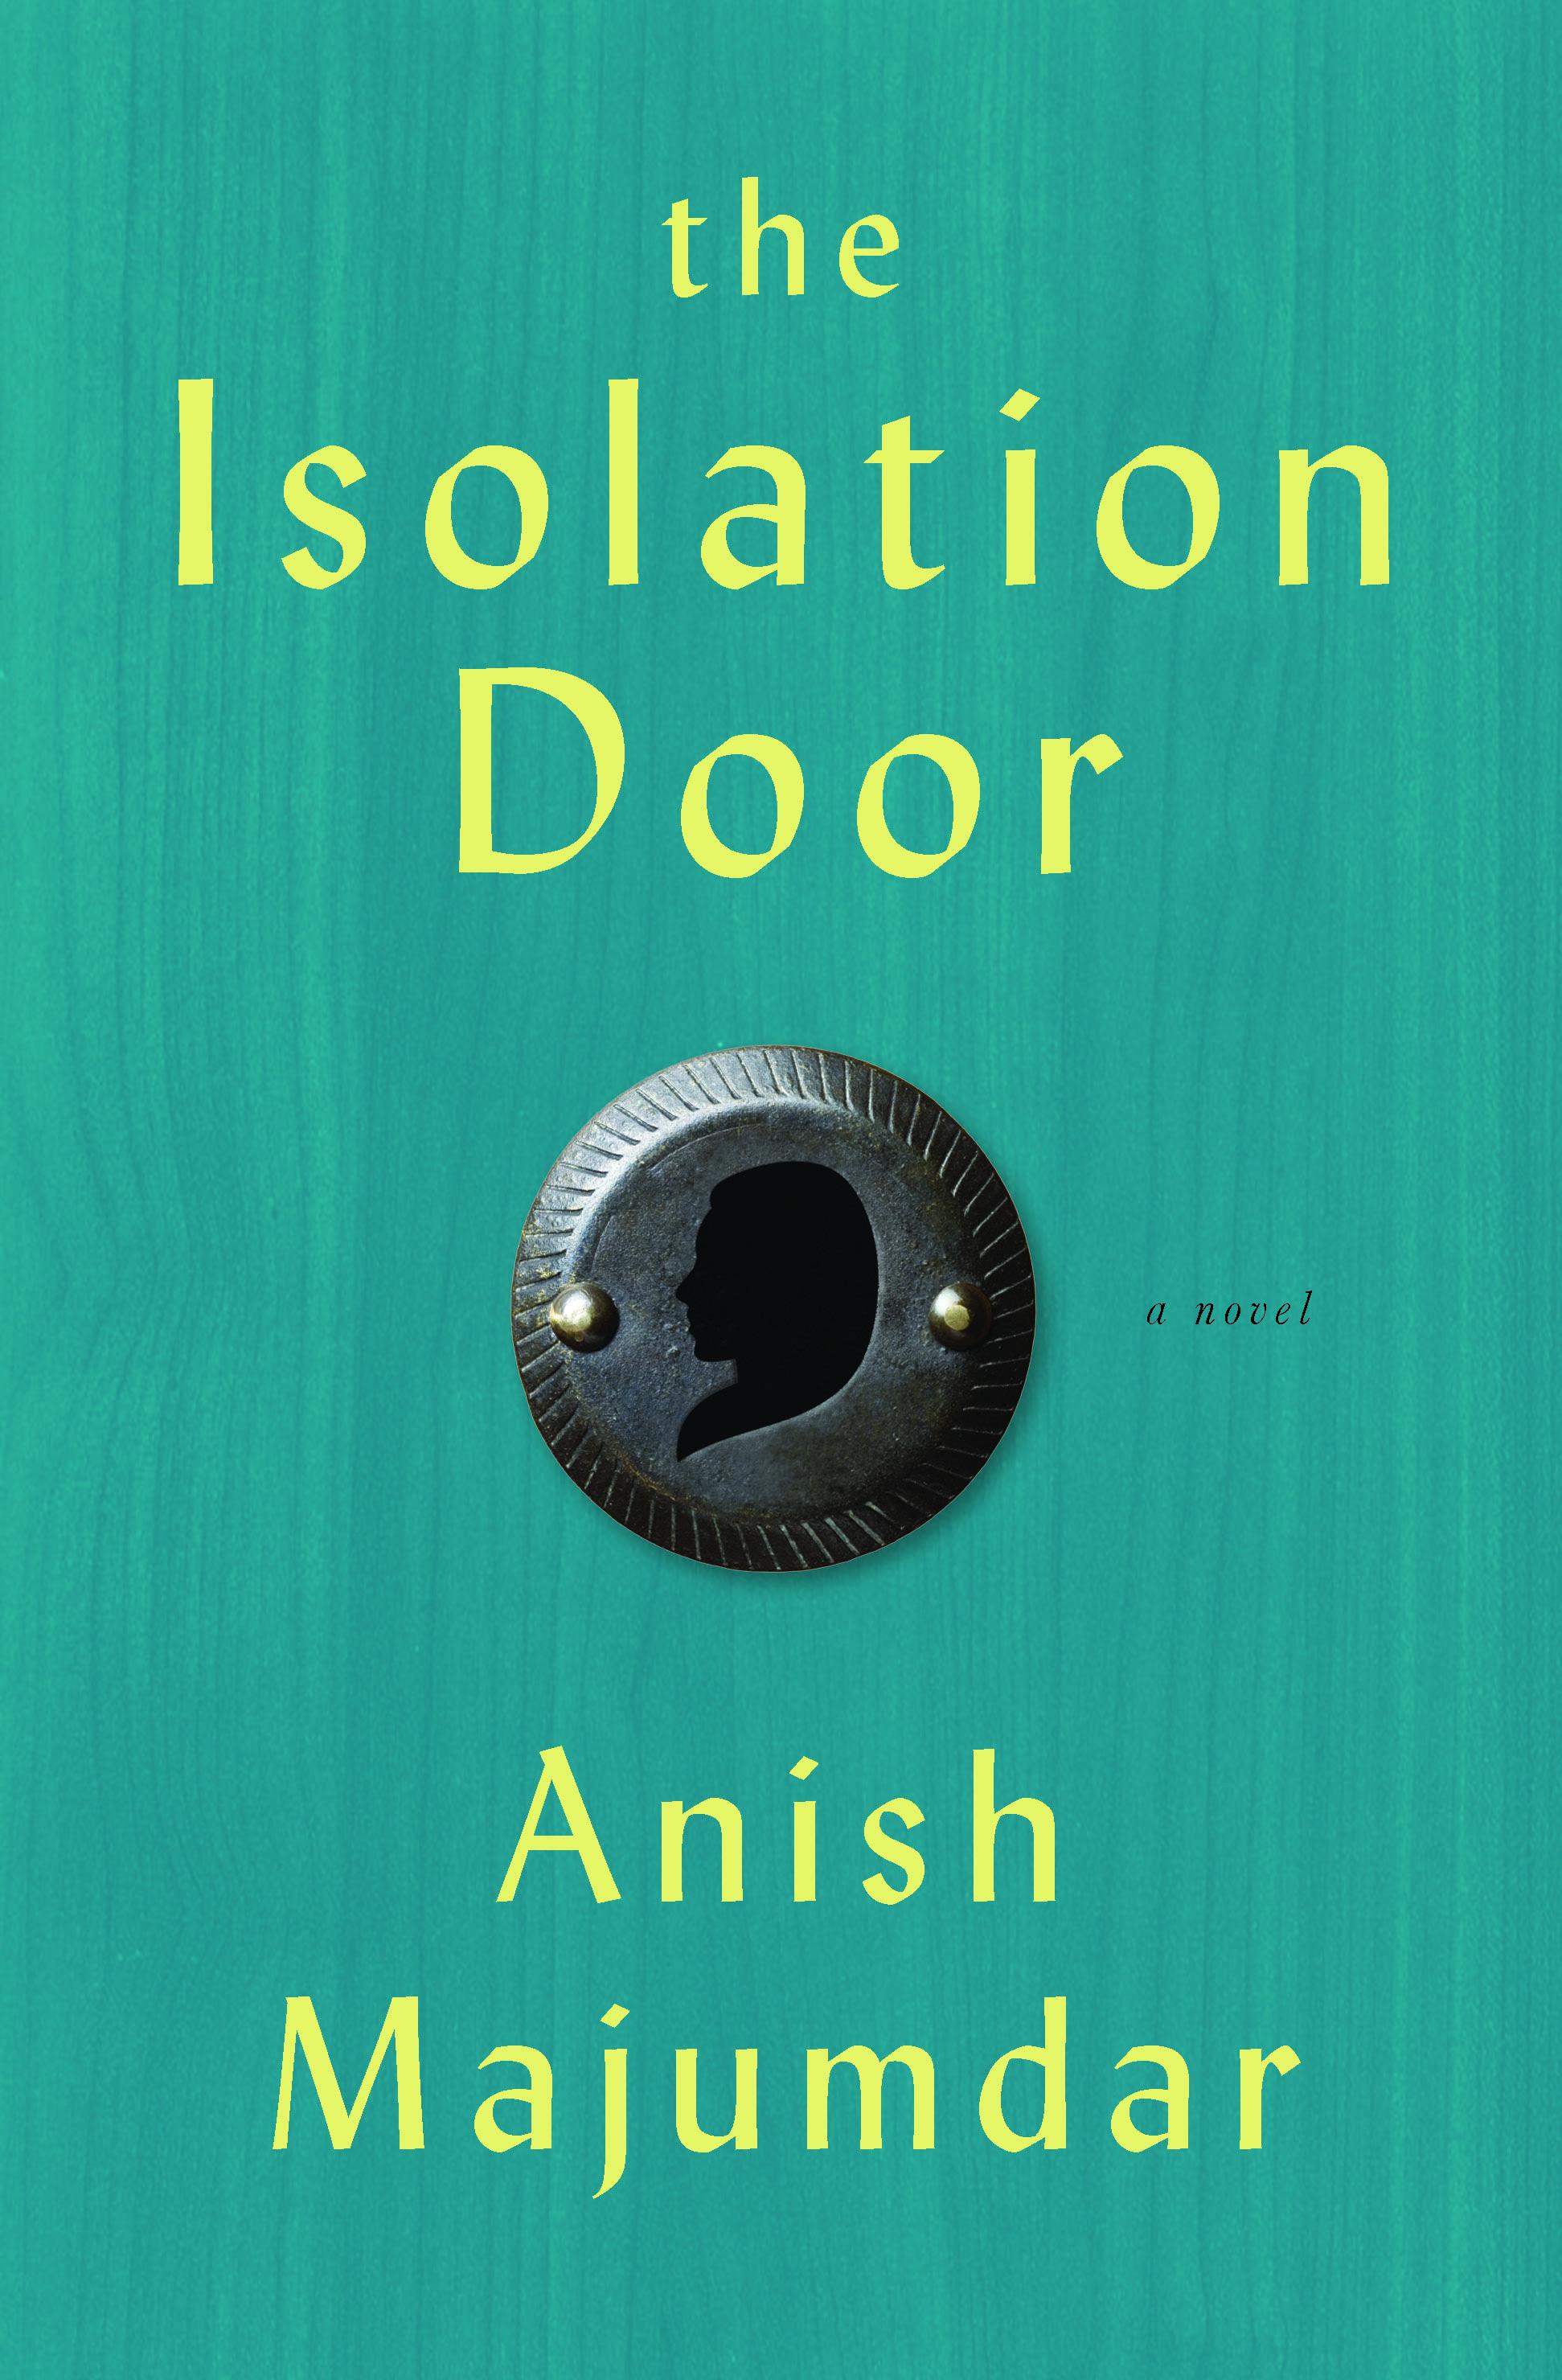 http://www.amazon.com/Isolation-Door-Novel-Anish-Majumdar-ebook/dp/B00I29CL8A/